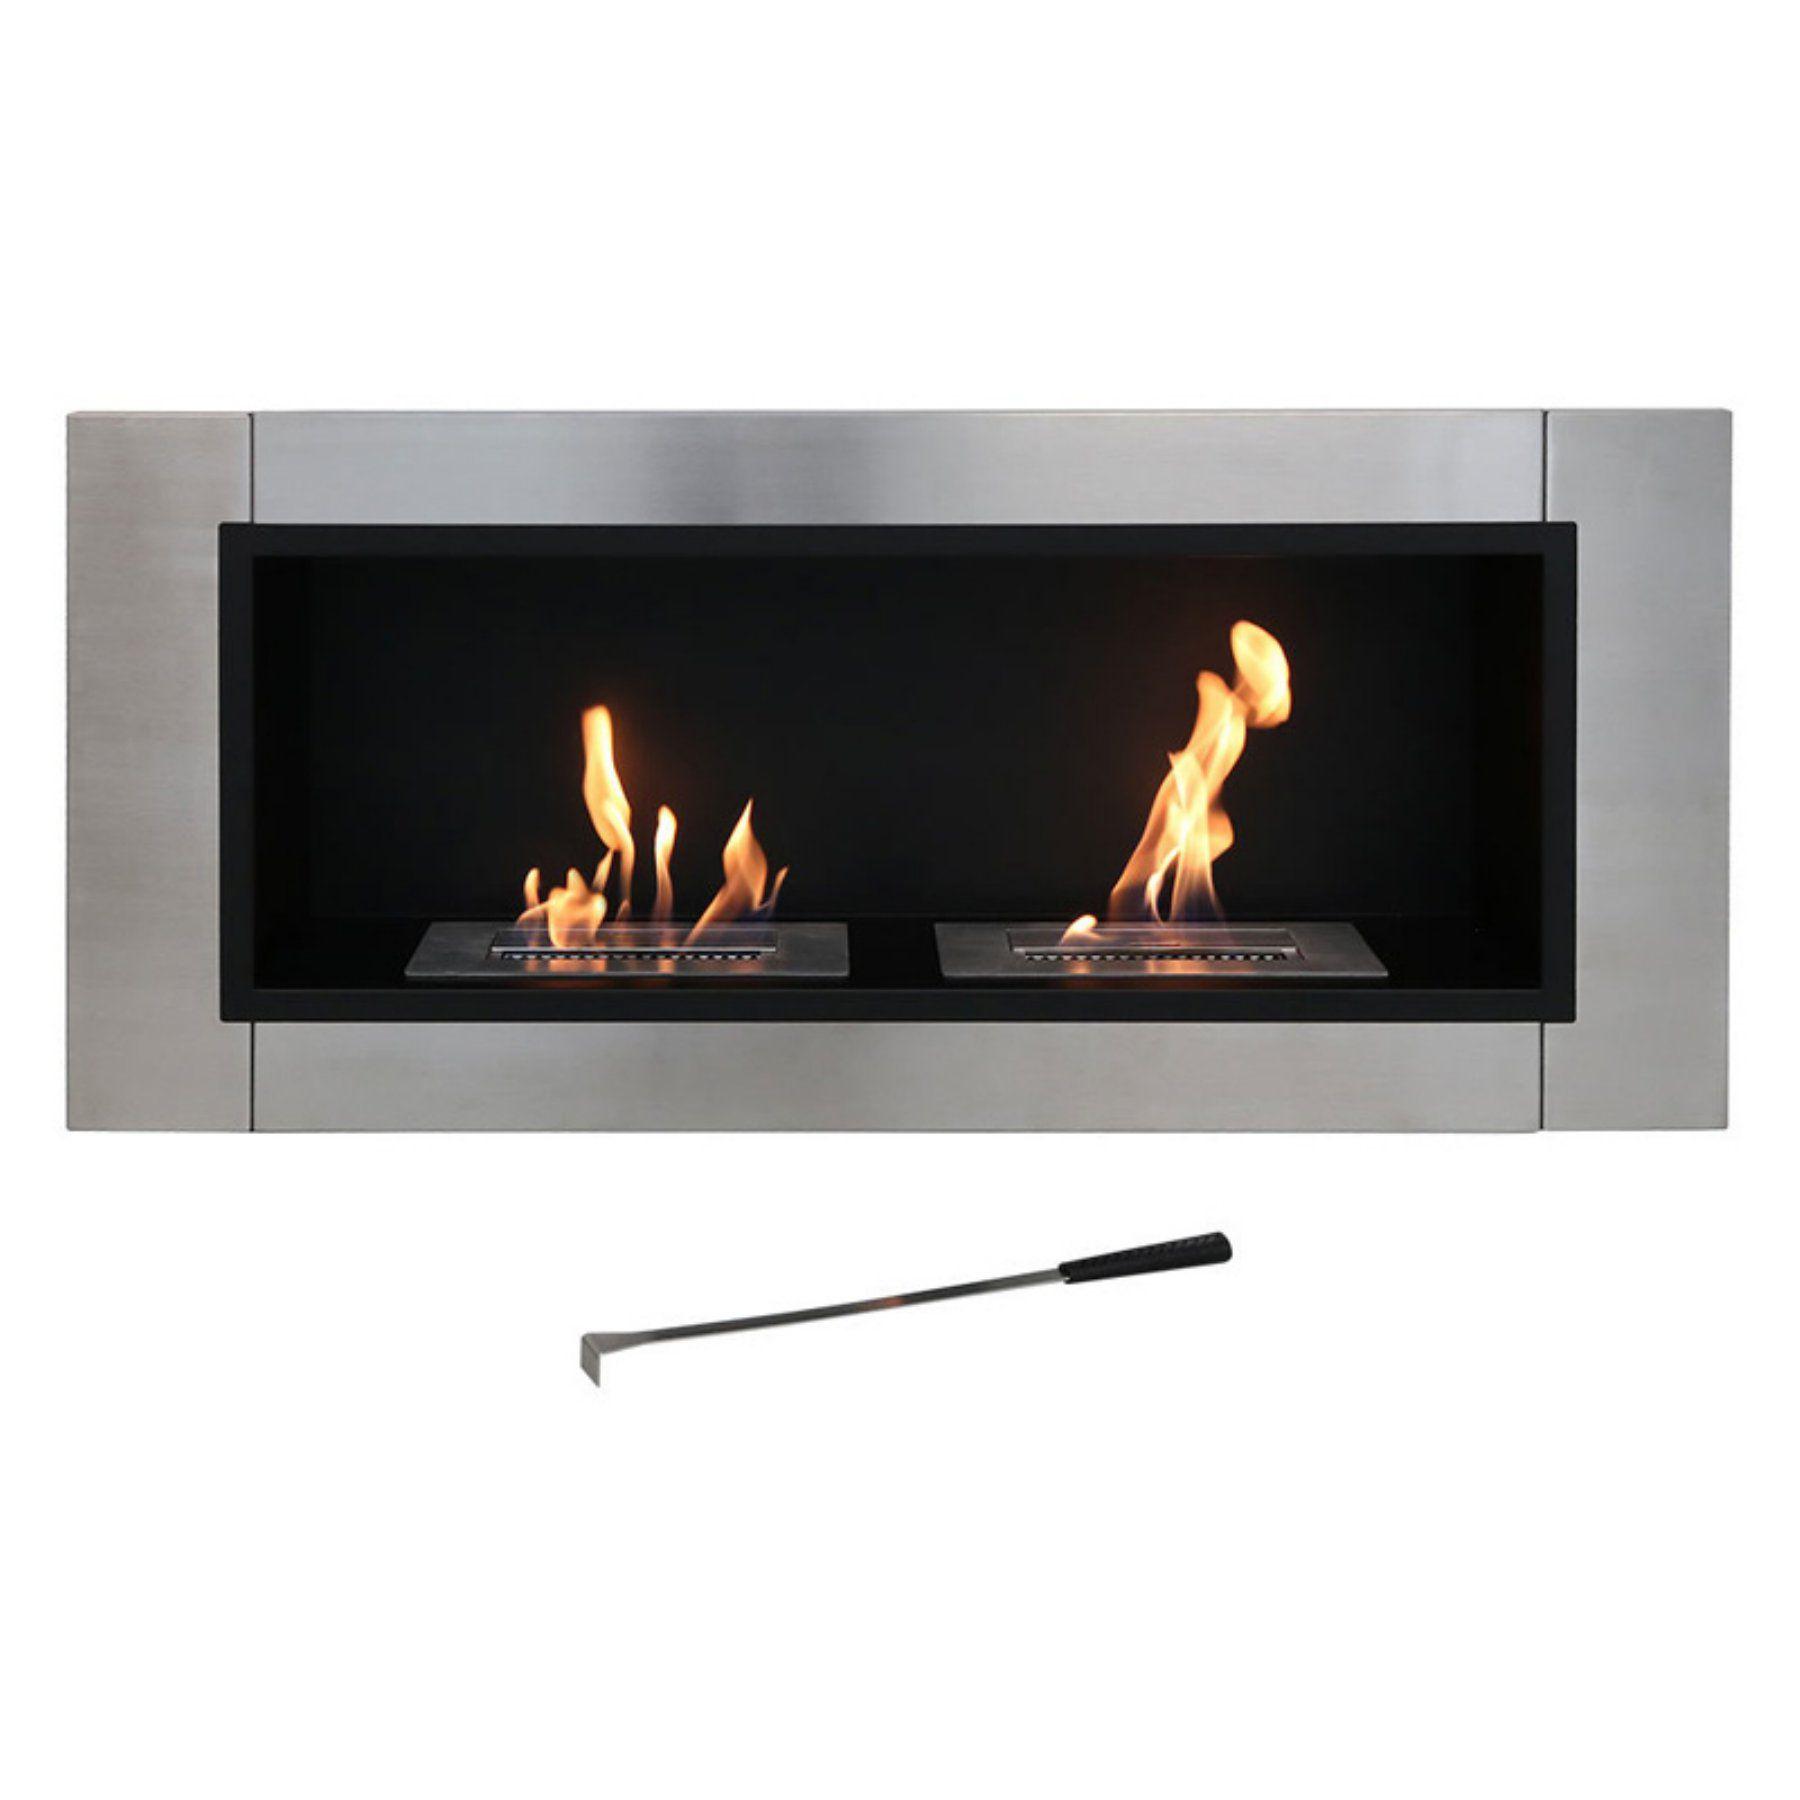 Sunnydaze Decor Scalda Ventless Wall Mounted Bio Ethanol Fireplace Yl 078 Bioethanol Fireplace Ethanol Fireplace